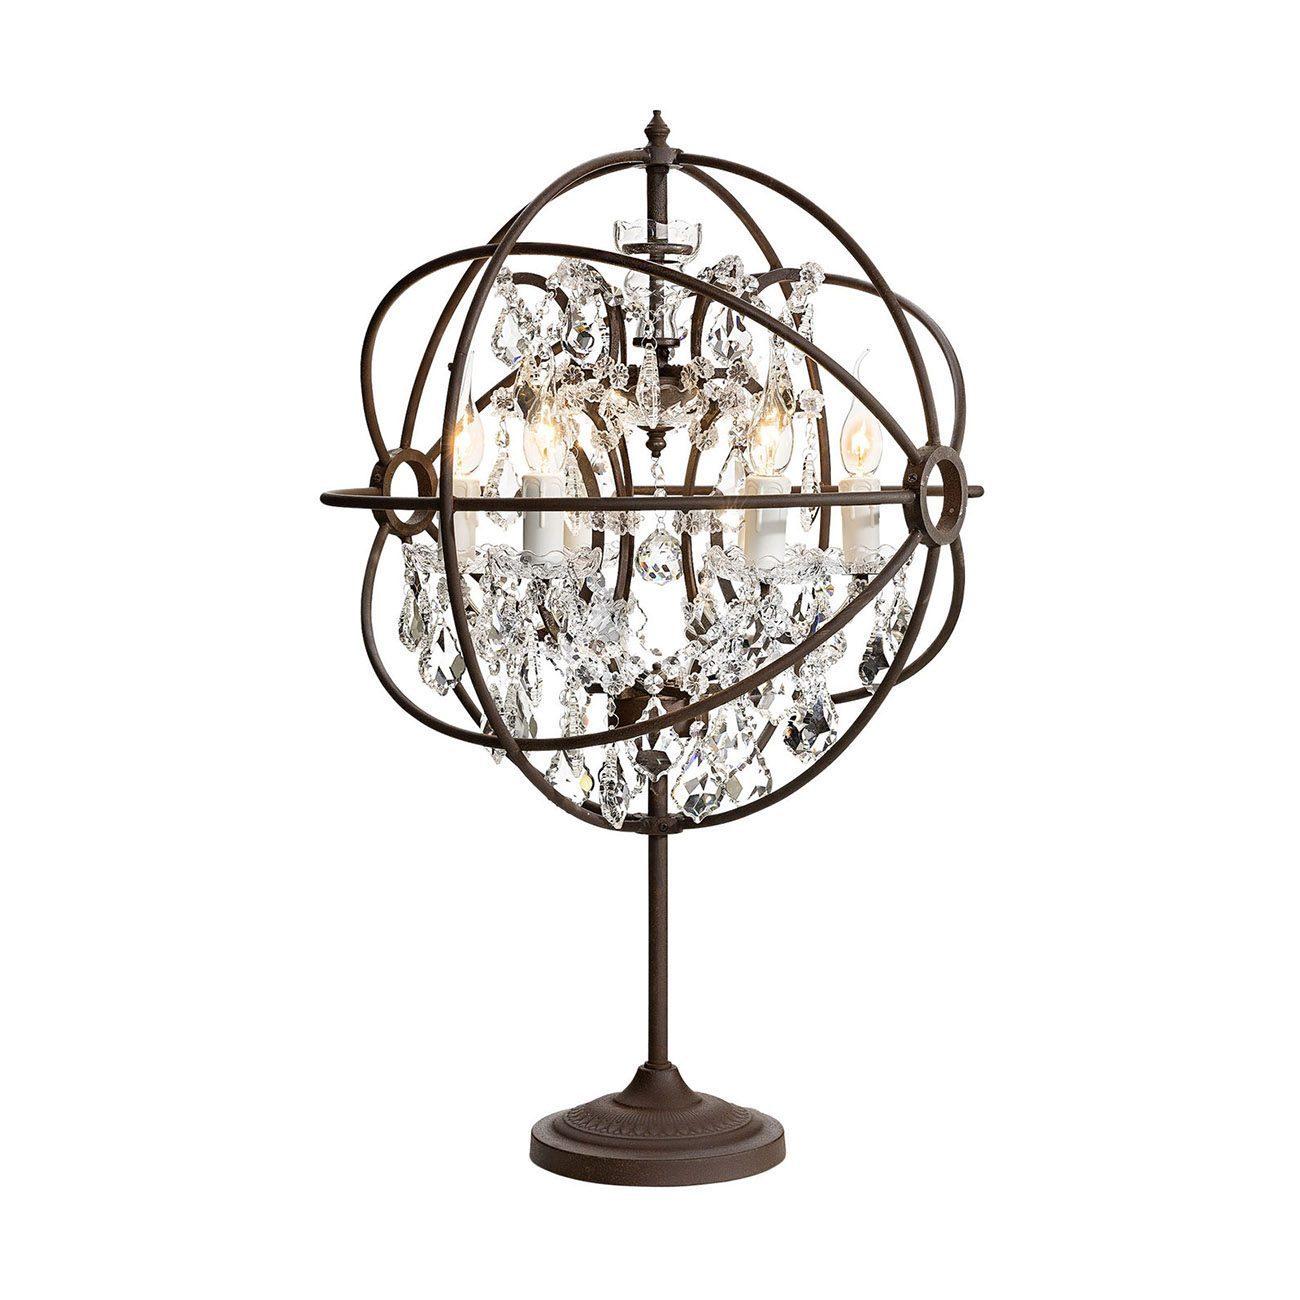 Gyro bordslampa antik rost kristall prismor från Artwood.